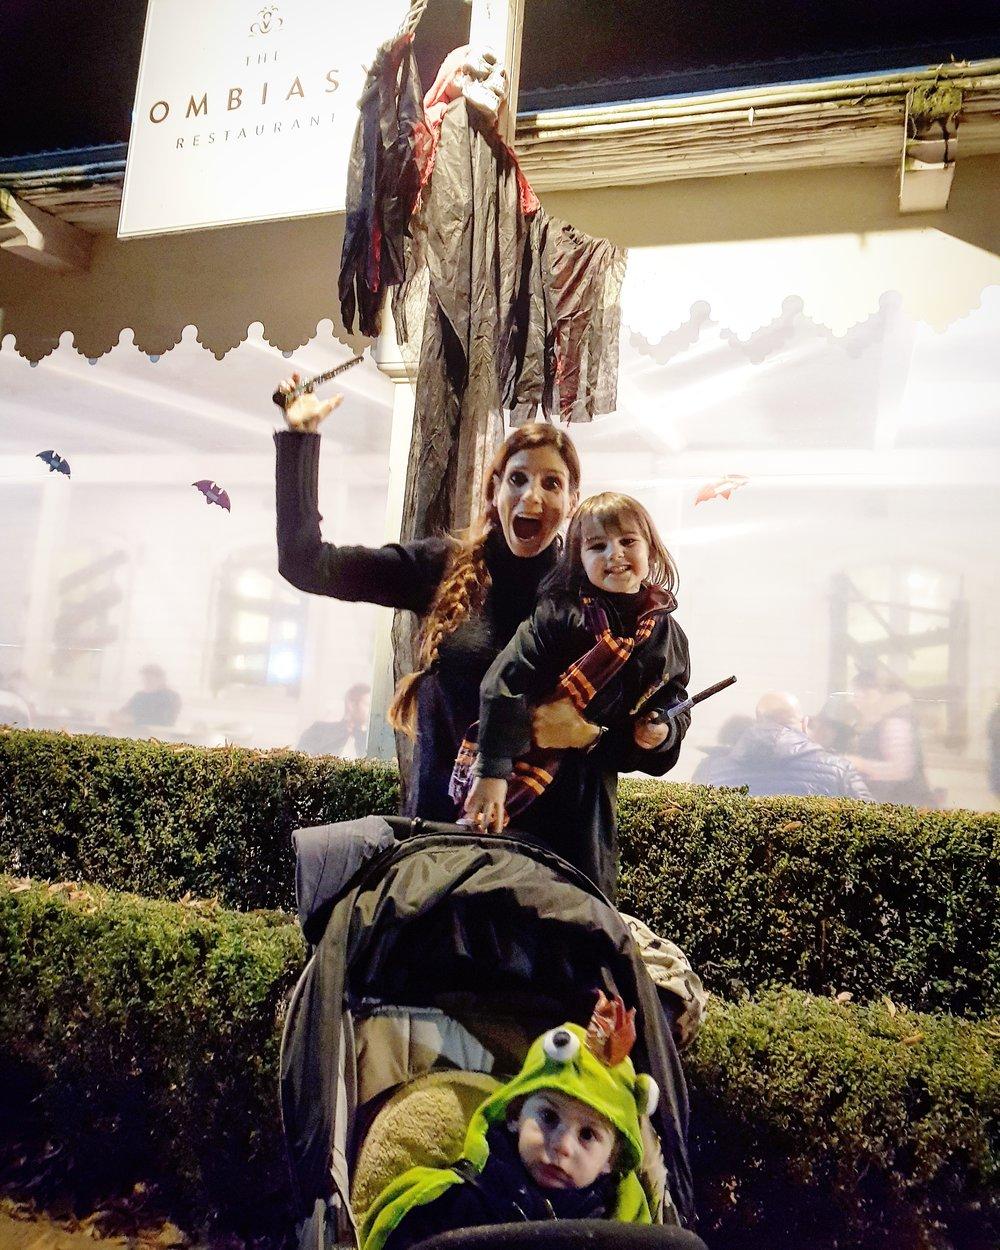 easymomswissmade_marie_biondini_zoom_piemonte_torino_bioparco_halloween_party_festeggiamenti_famiglia_bambini_foto003